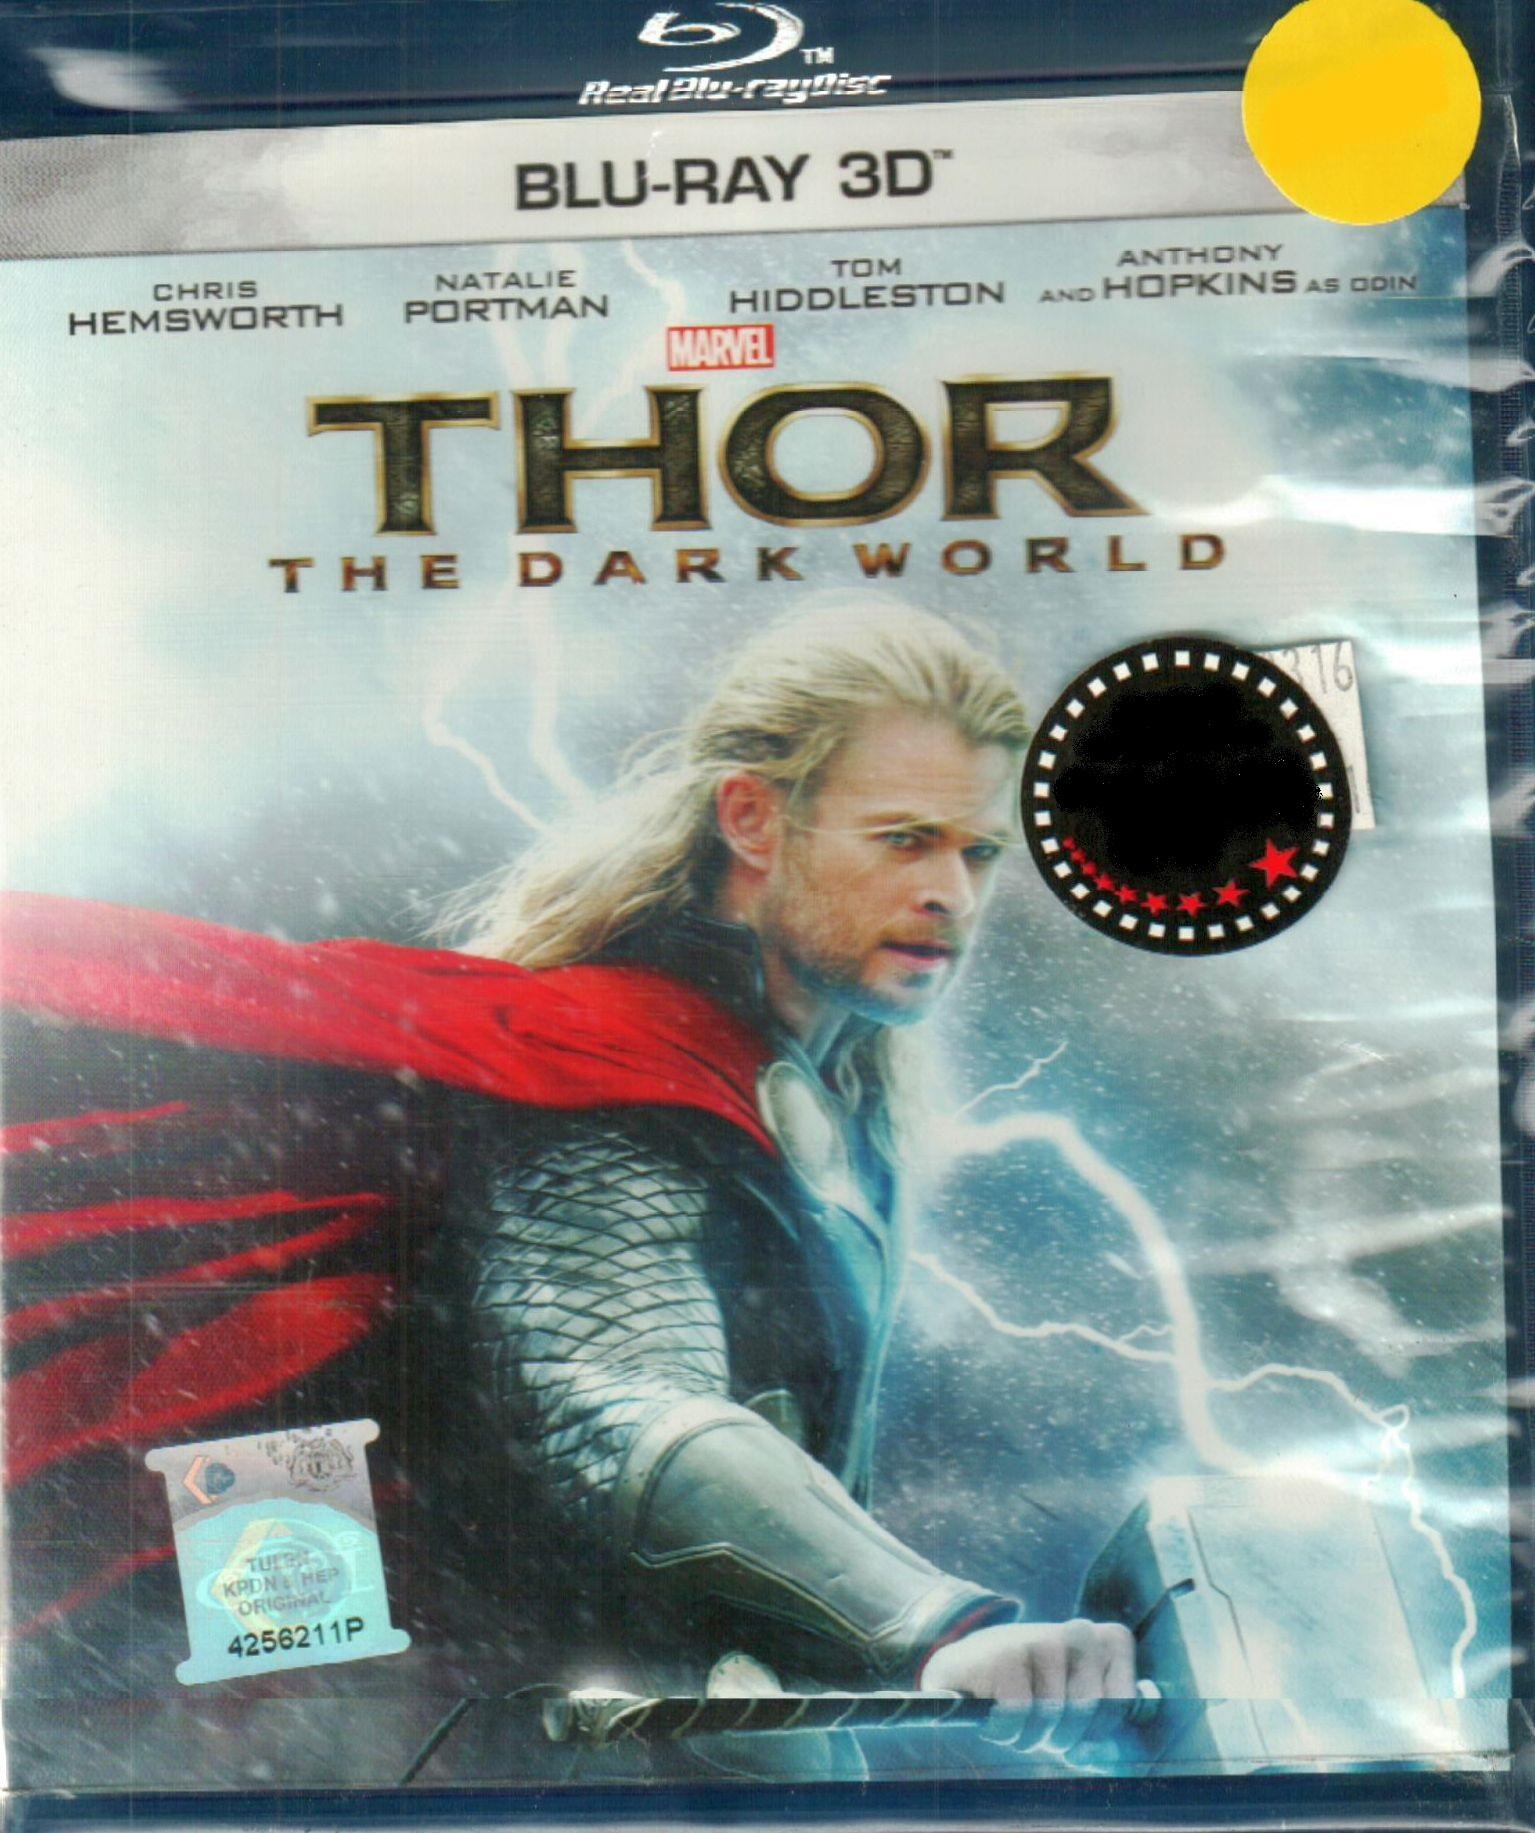 Thor The Dark World Blu-Ray 3D